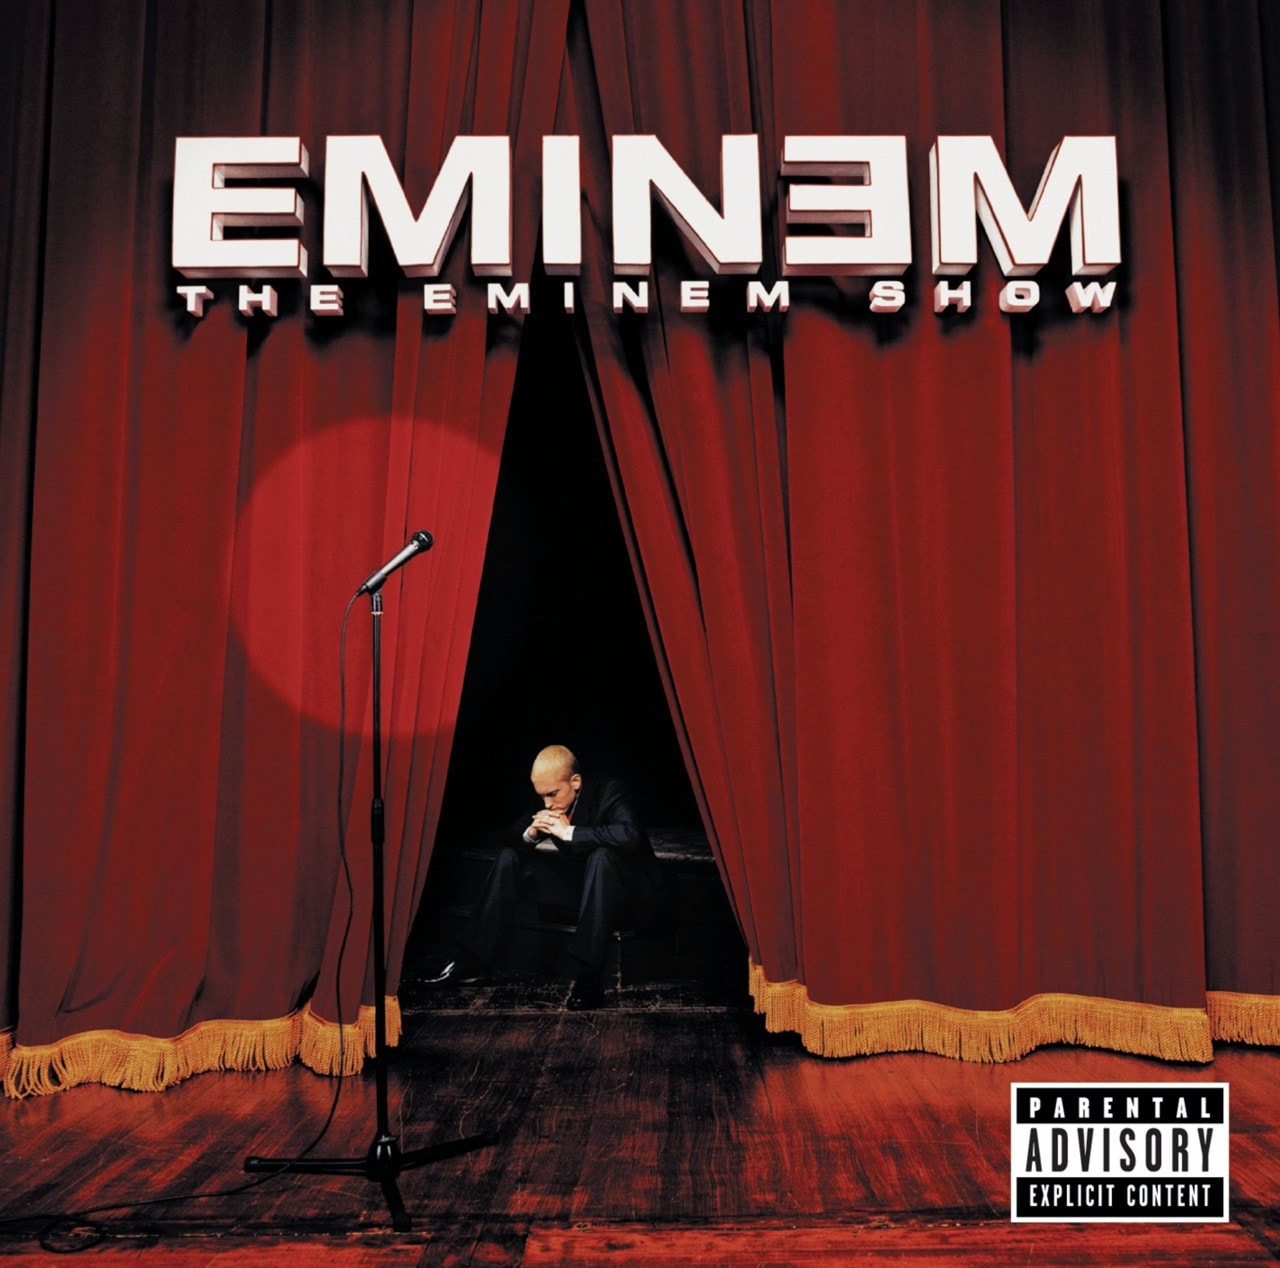 The Eminem Show - 1